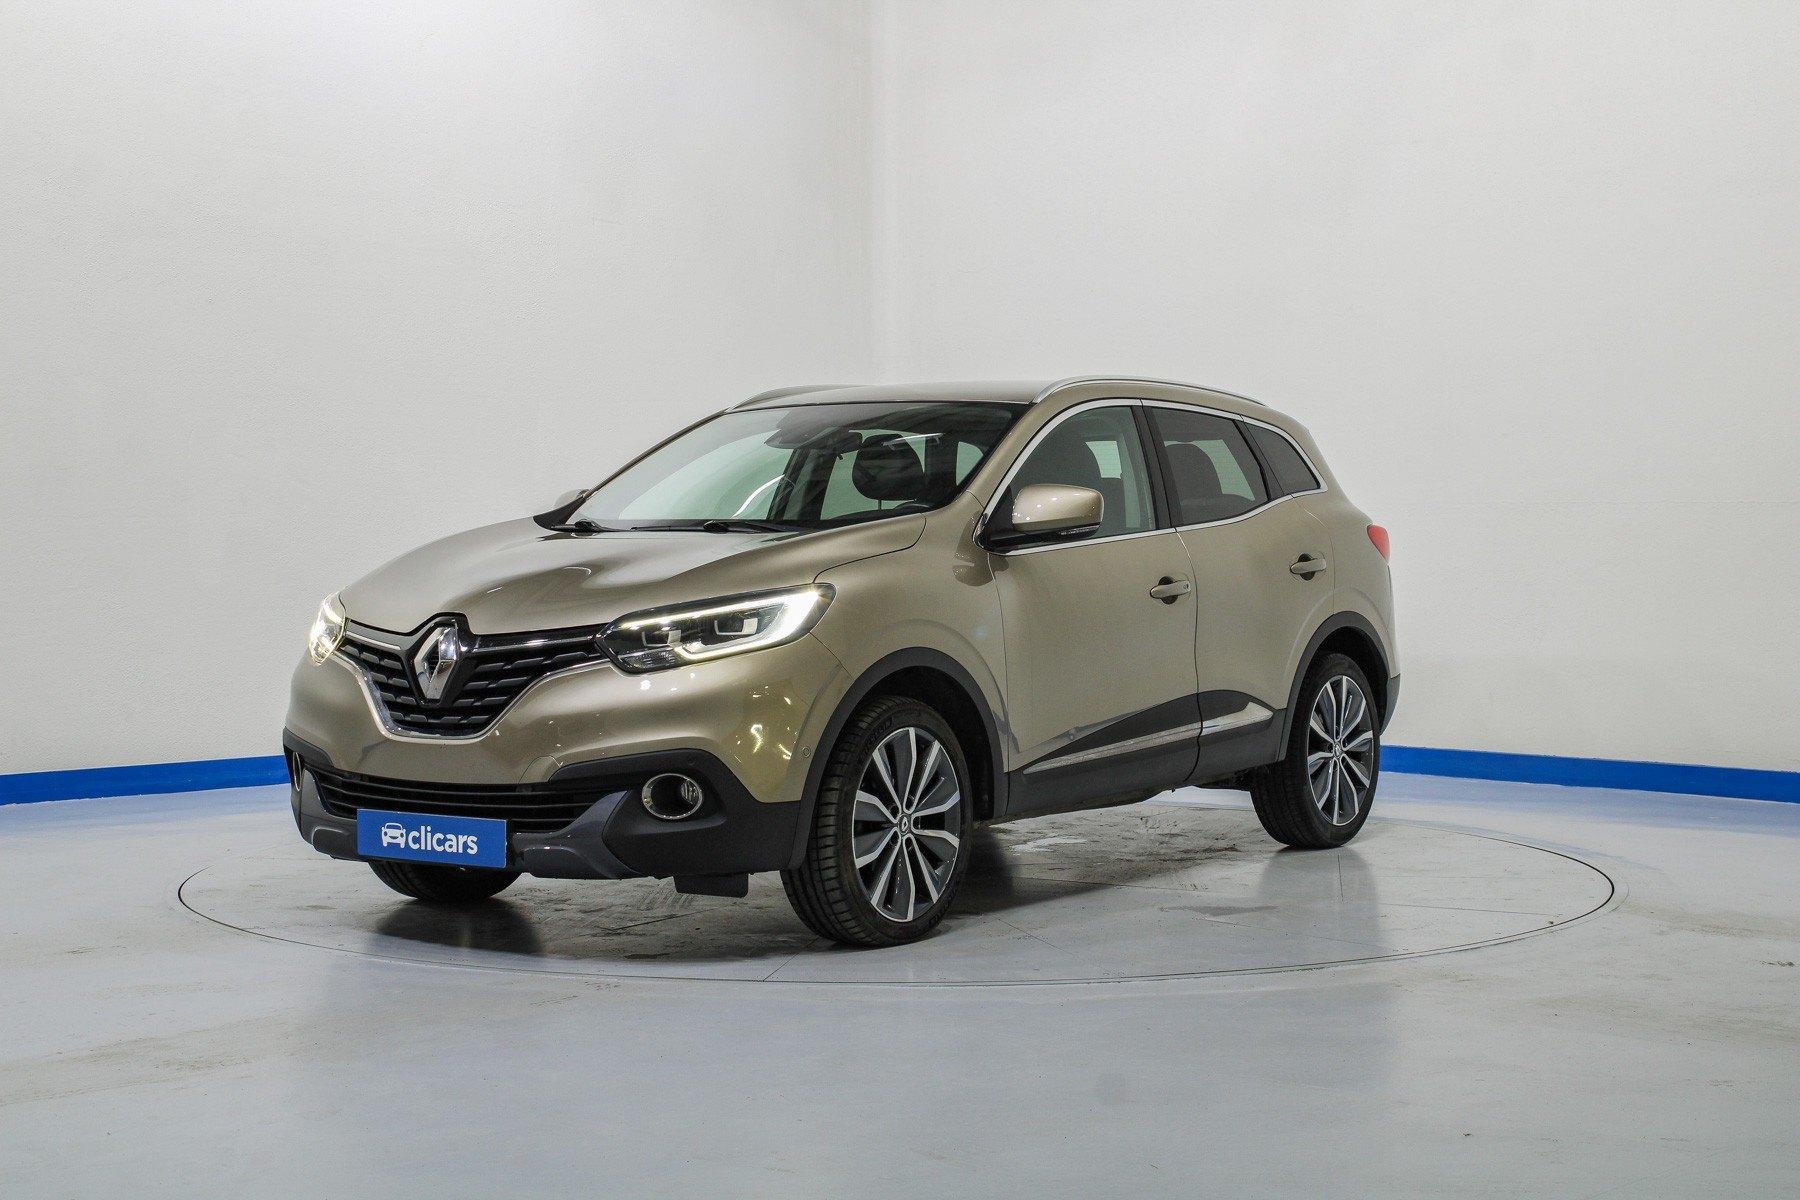 Renault Kadjar Diésel Intens Energy dCi 110 1